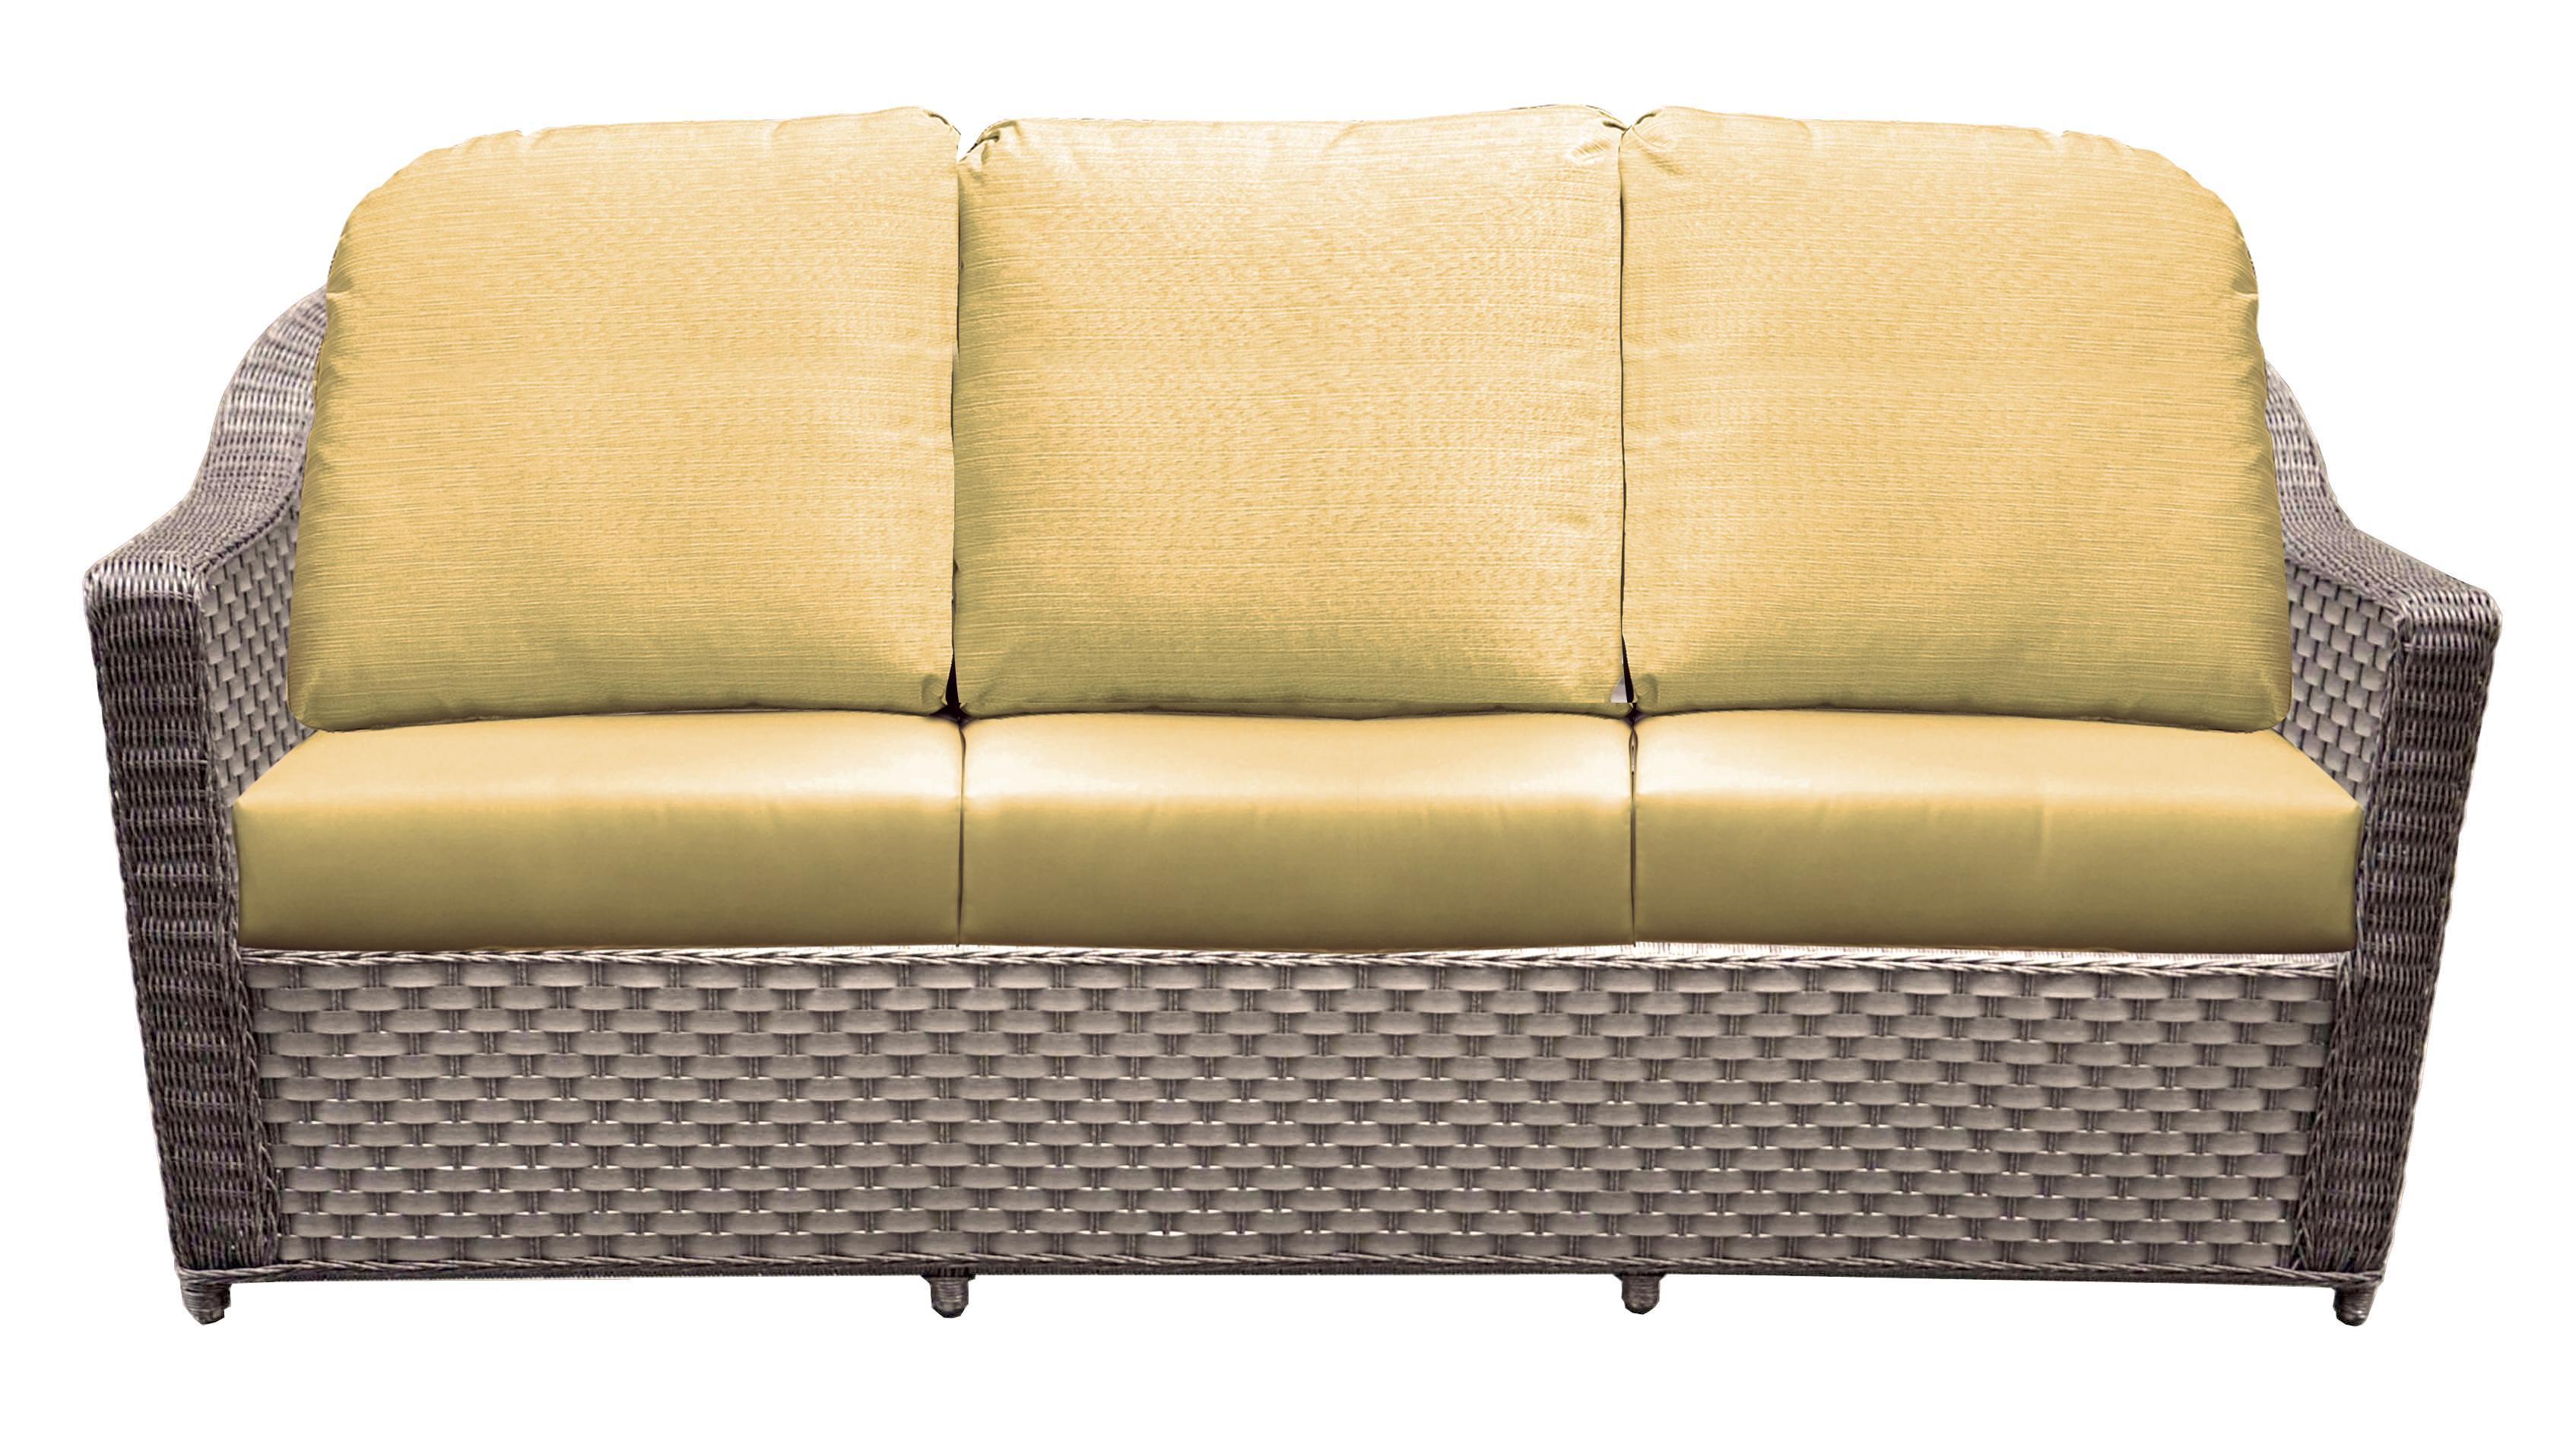 Northcape International Covington Wicker Three Seater Sofa